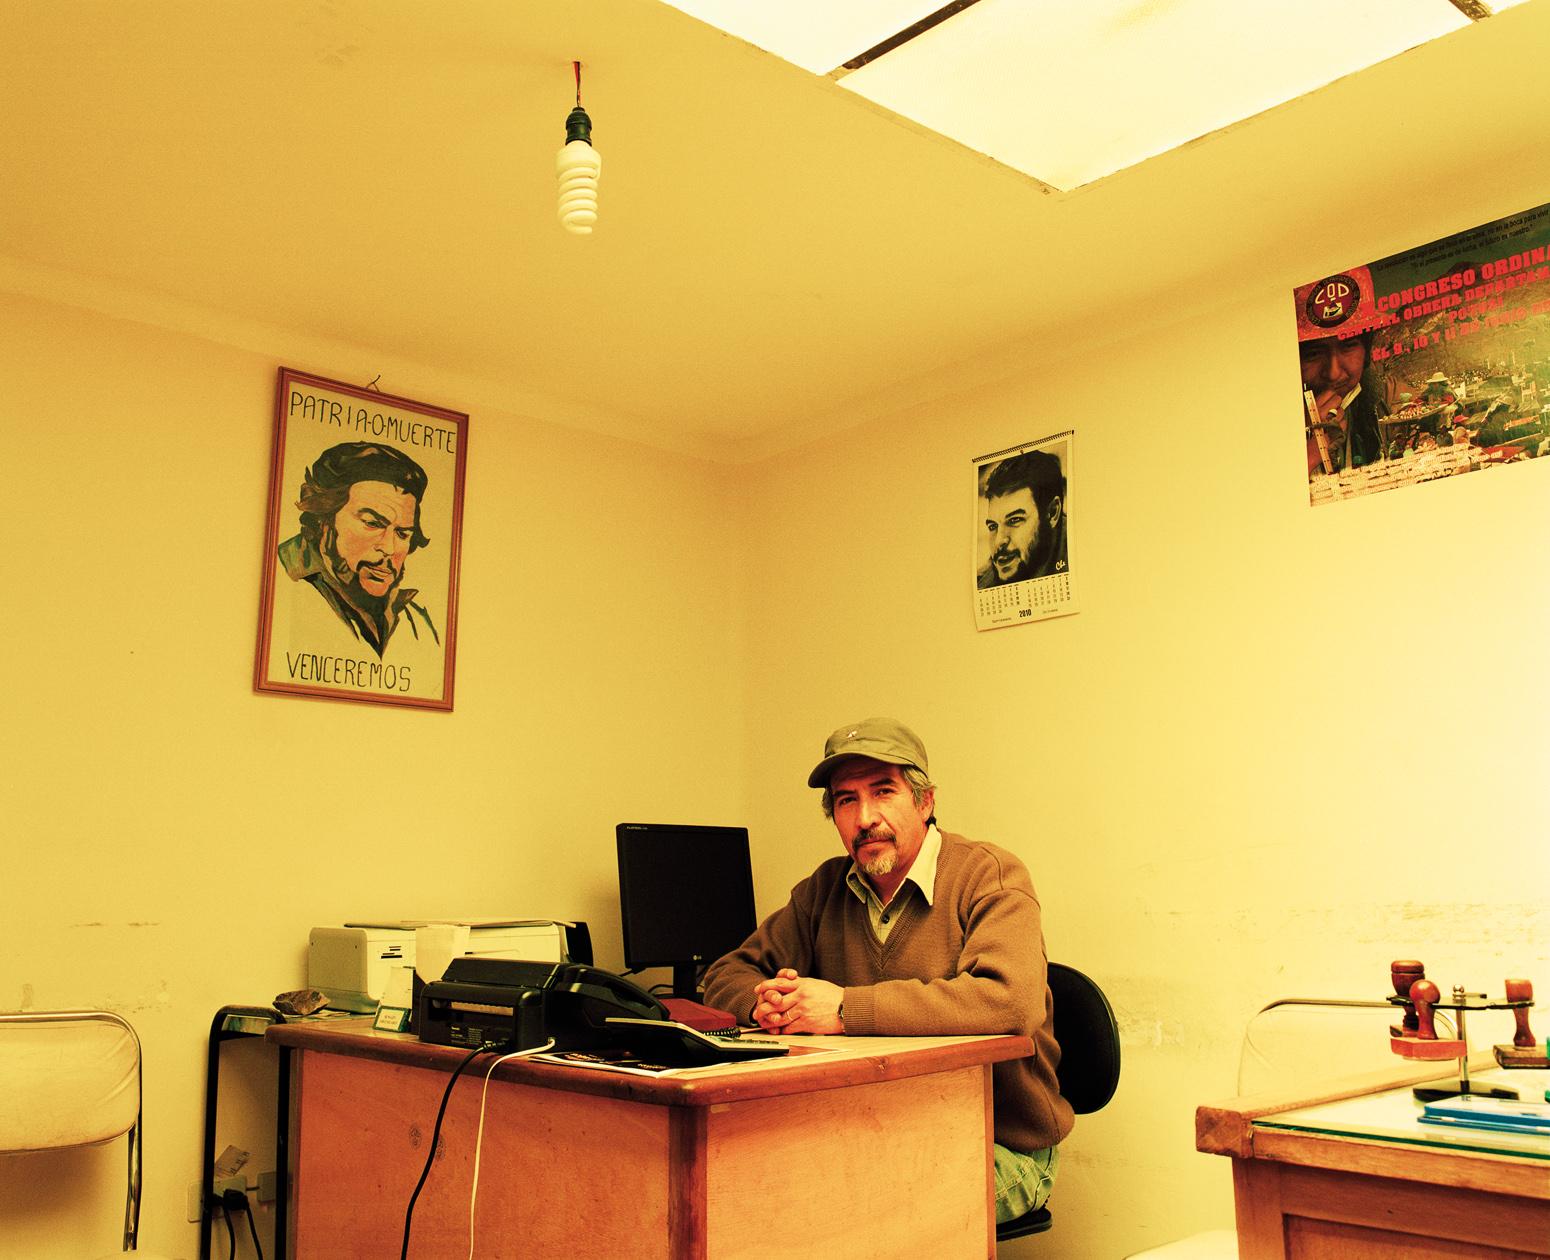 diplom_bolivien_1_film_90_02_fullscan_sauber_1550PX_WEB.jpg